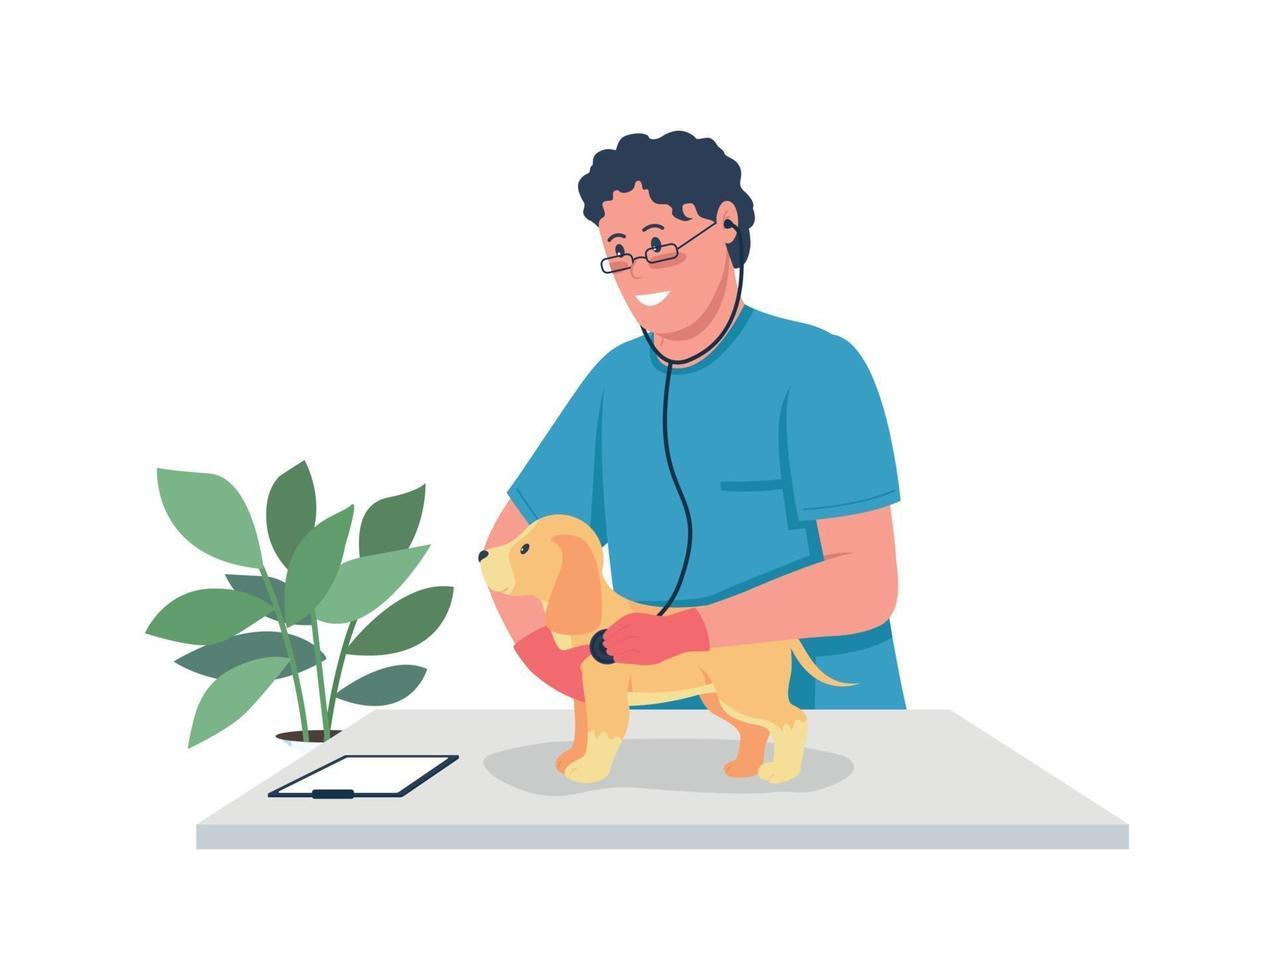 dierenarts arts die puppy egale kleur vector gedetailleerd karakter houdt